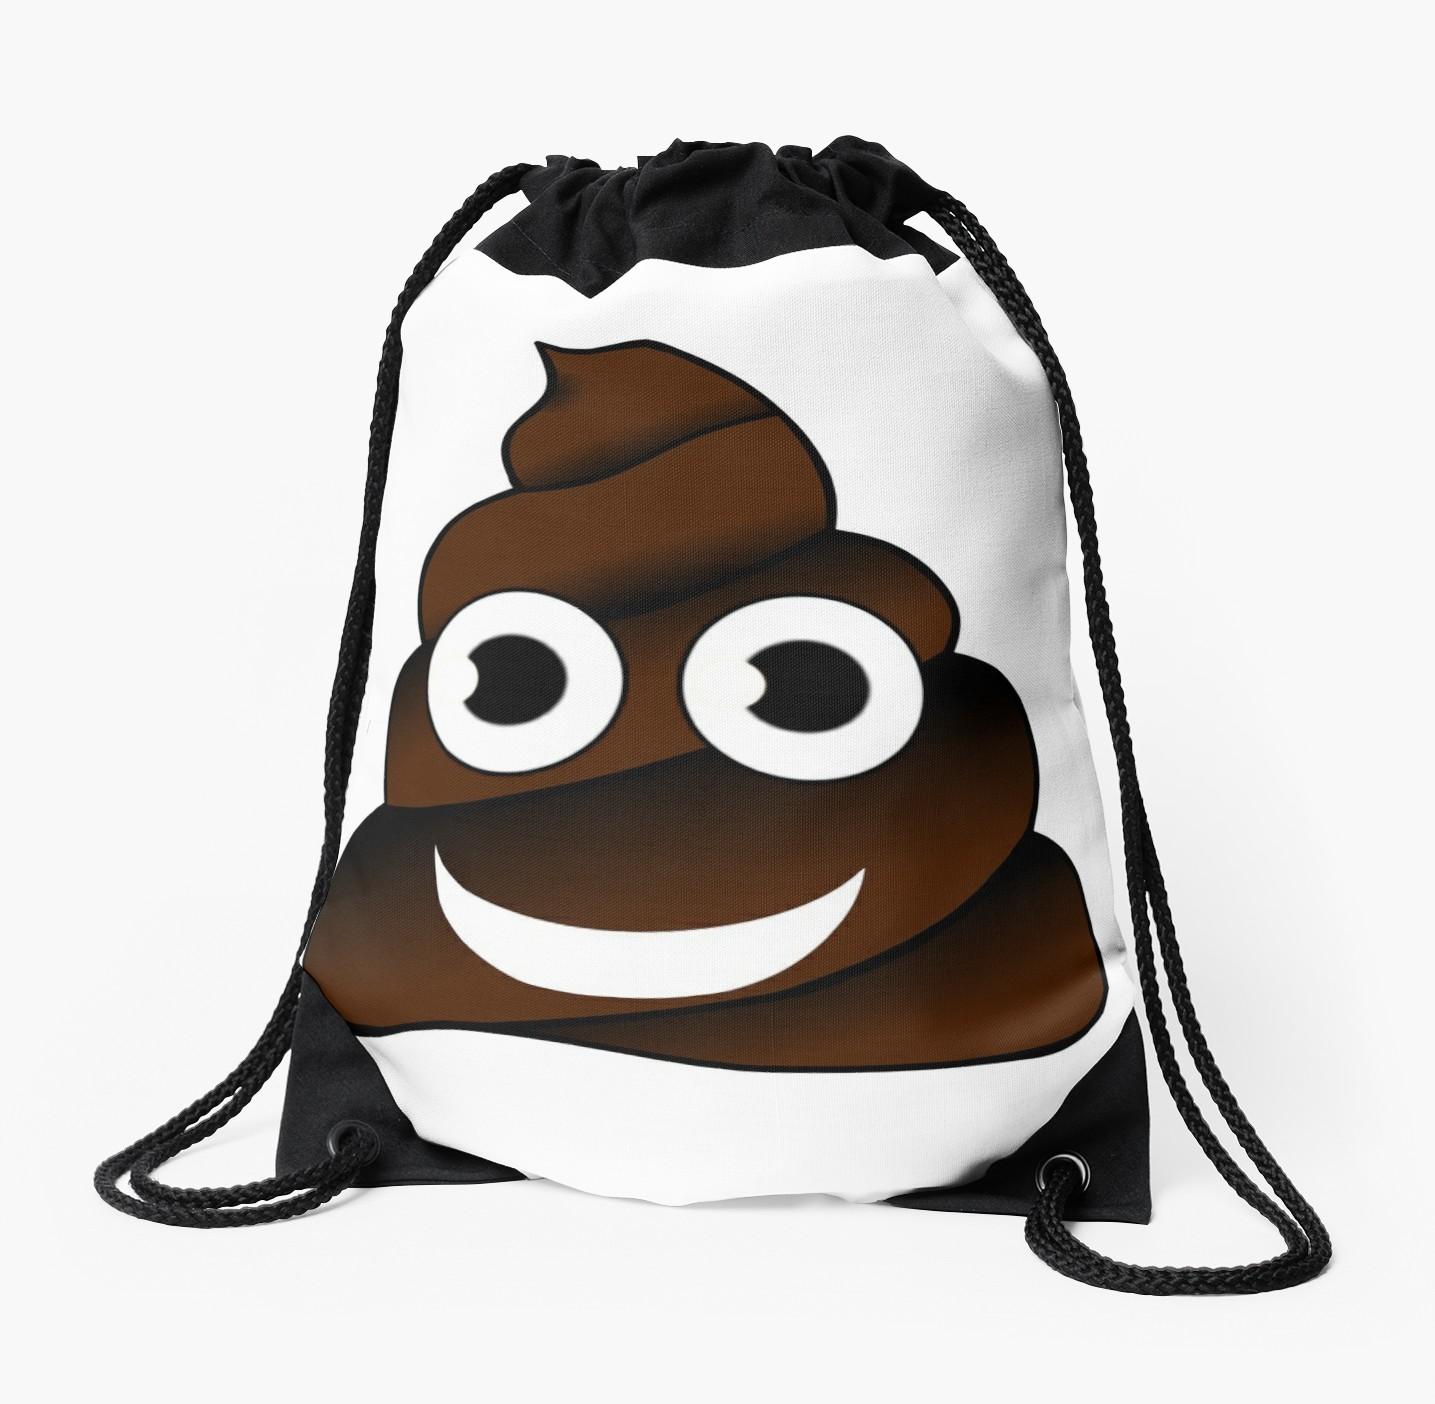 1435x1404 Pile Of Poo Poop Emoji Secret Santa Kris Kringle Emoji Shit